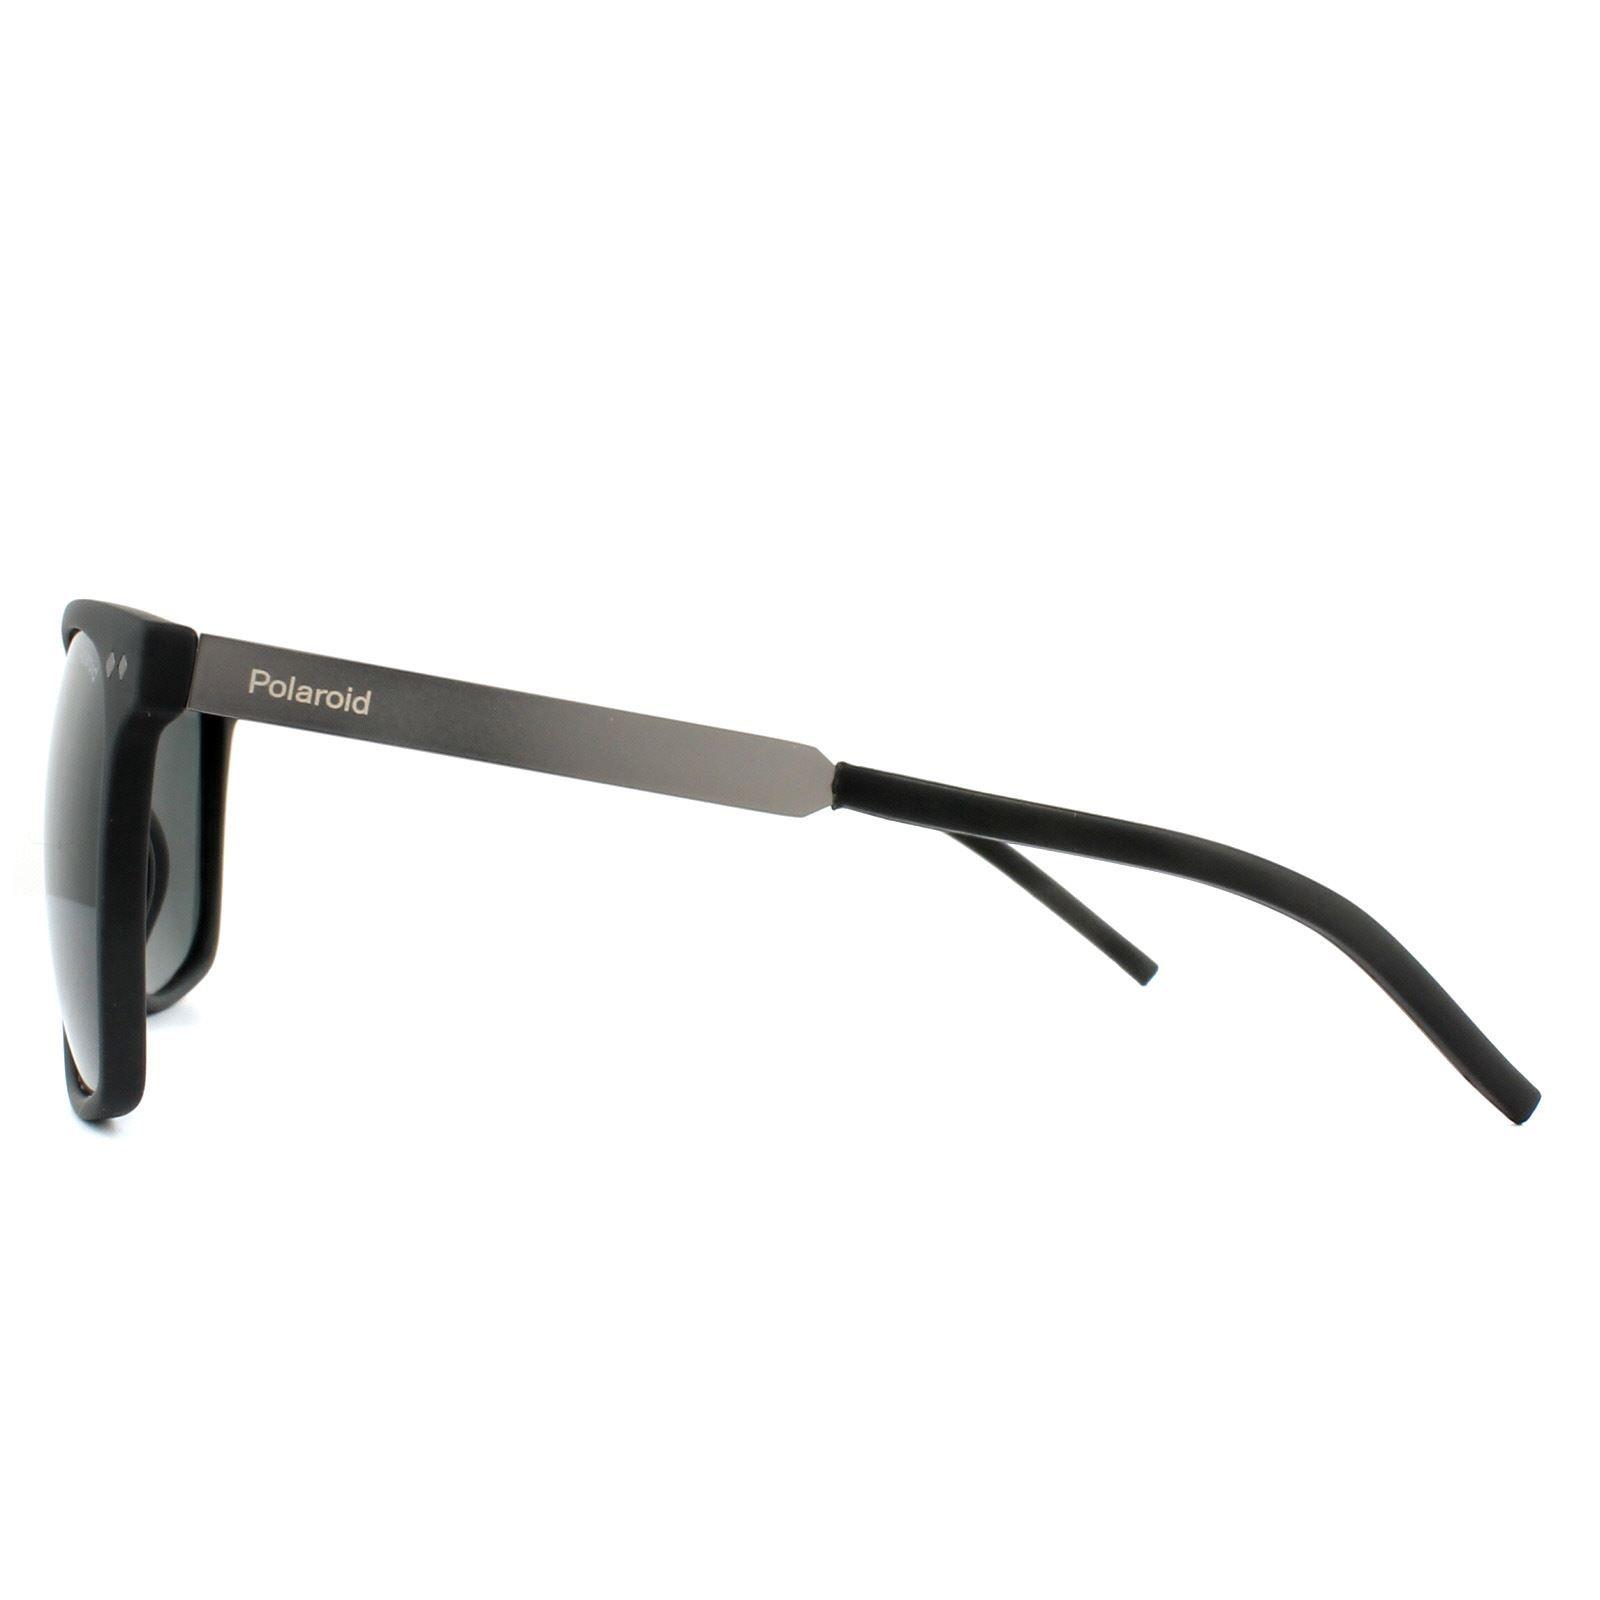 Polaroid Sunglasses PLD 1028/S 003 M9 Matt Black Grey Polarized